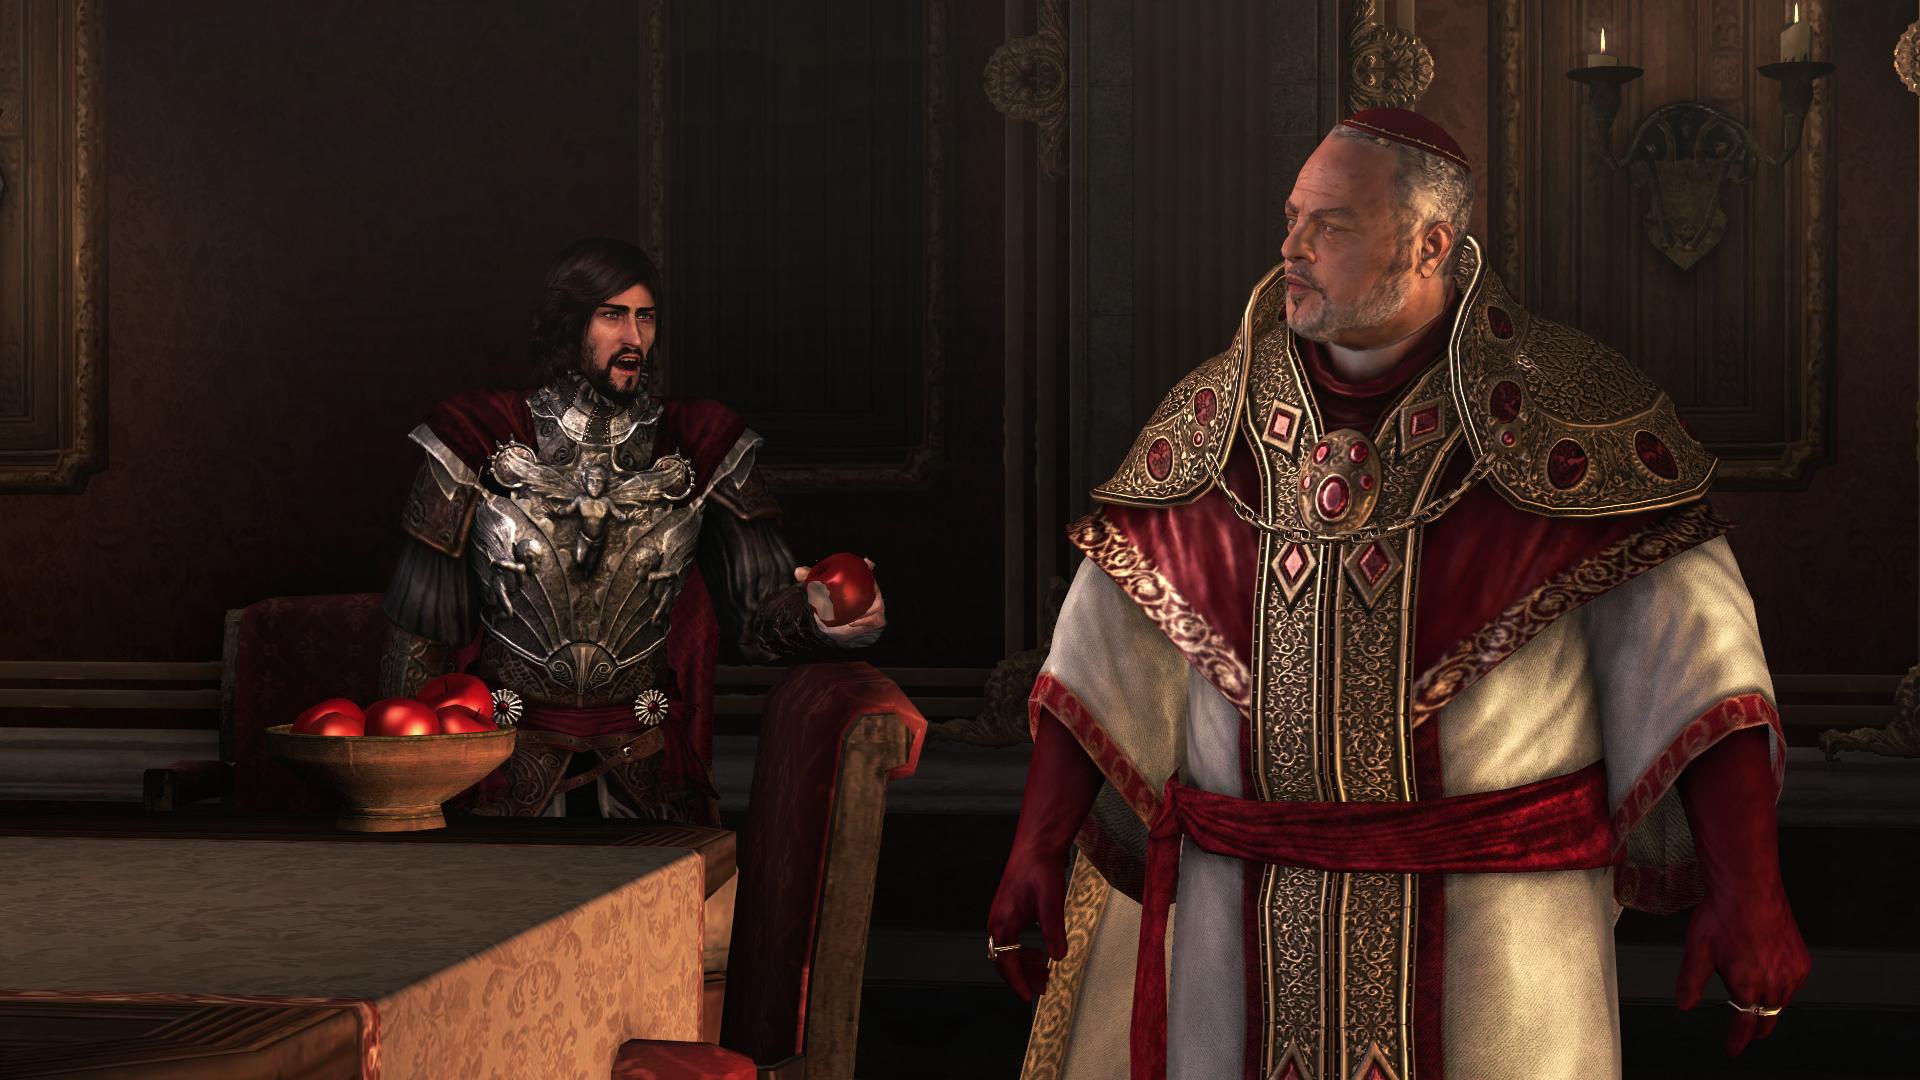 Juan Borgia the Elder | Assassins Creed Wiki | FANDOM